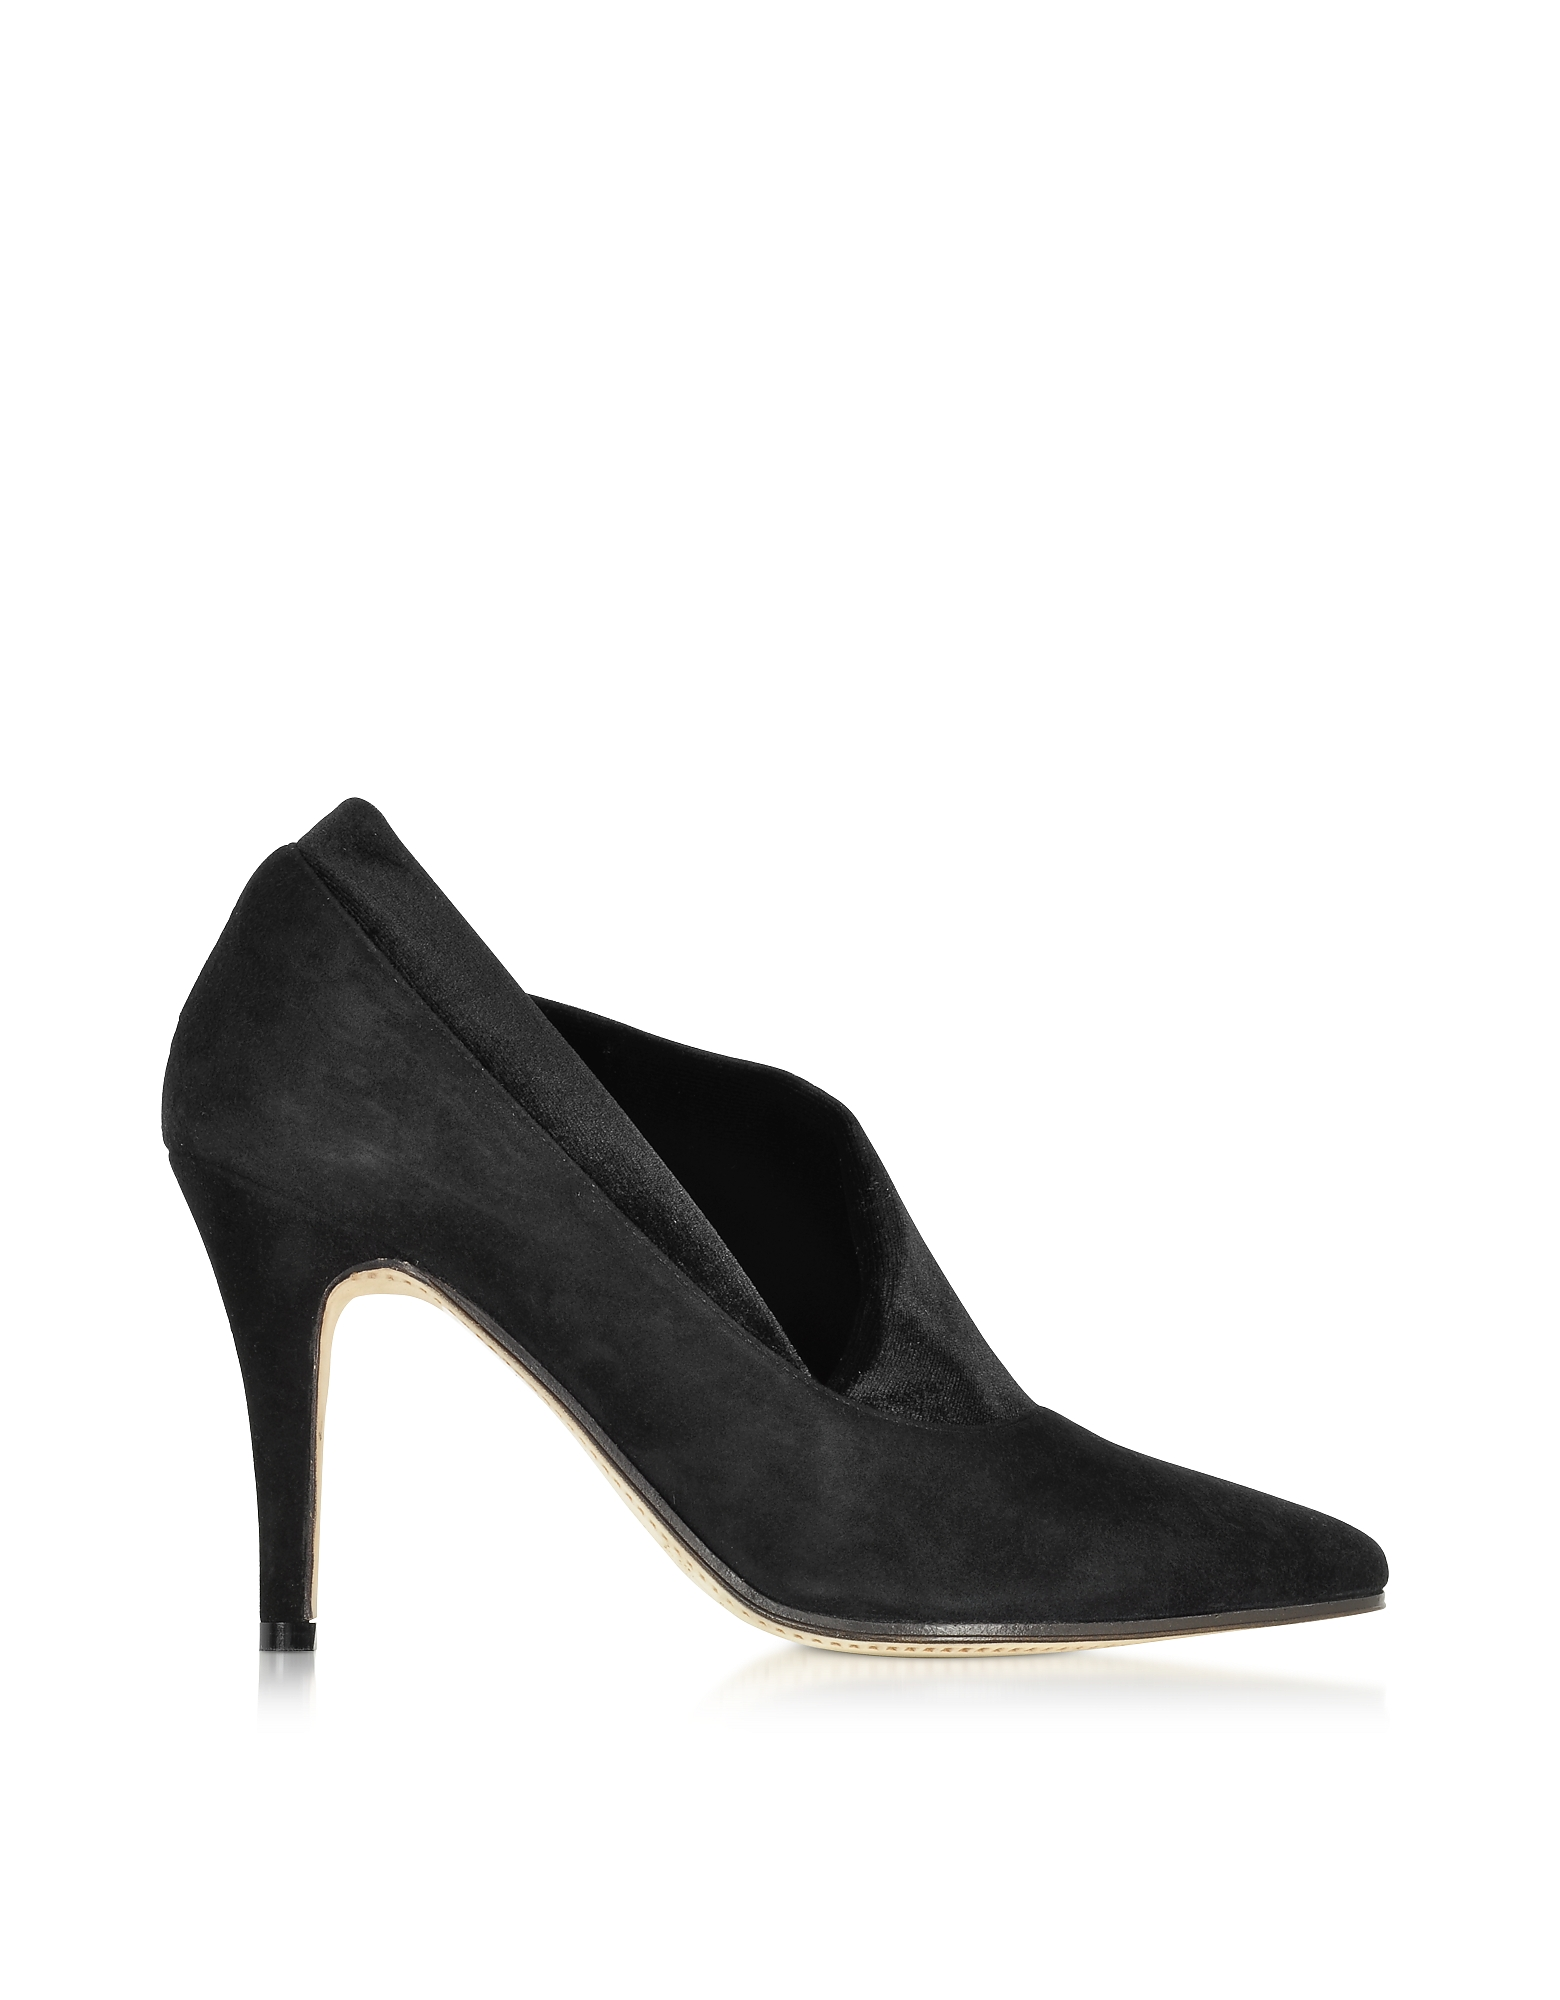 Noble - Черные Туфли-Лодочки из Замши и Бархата